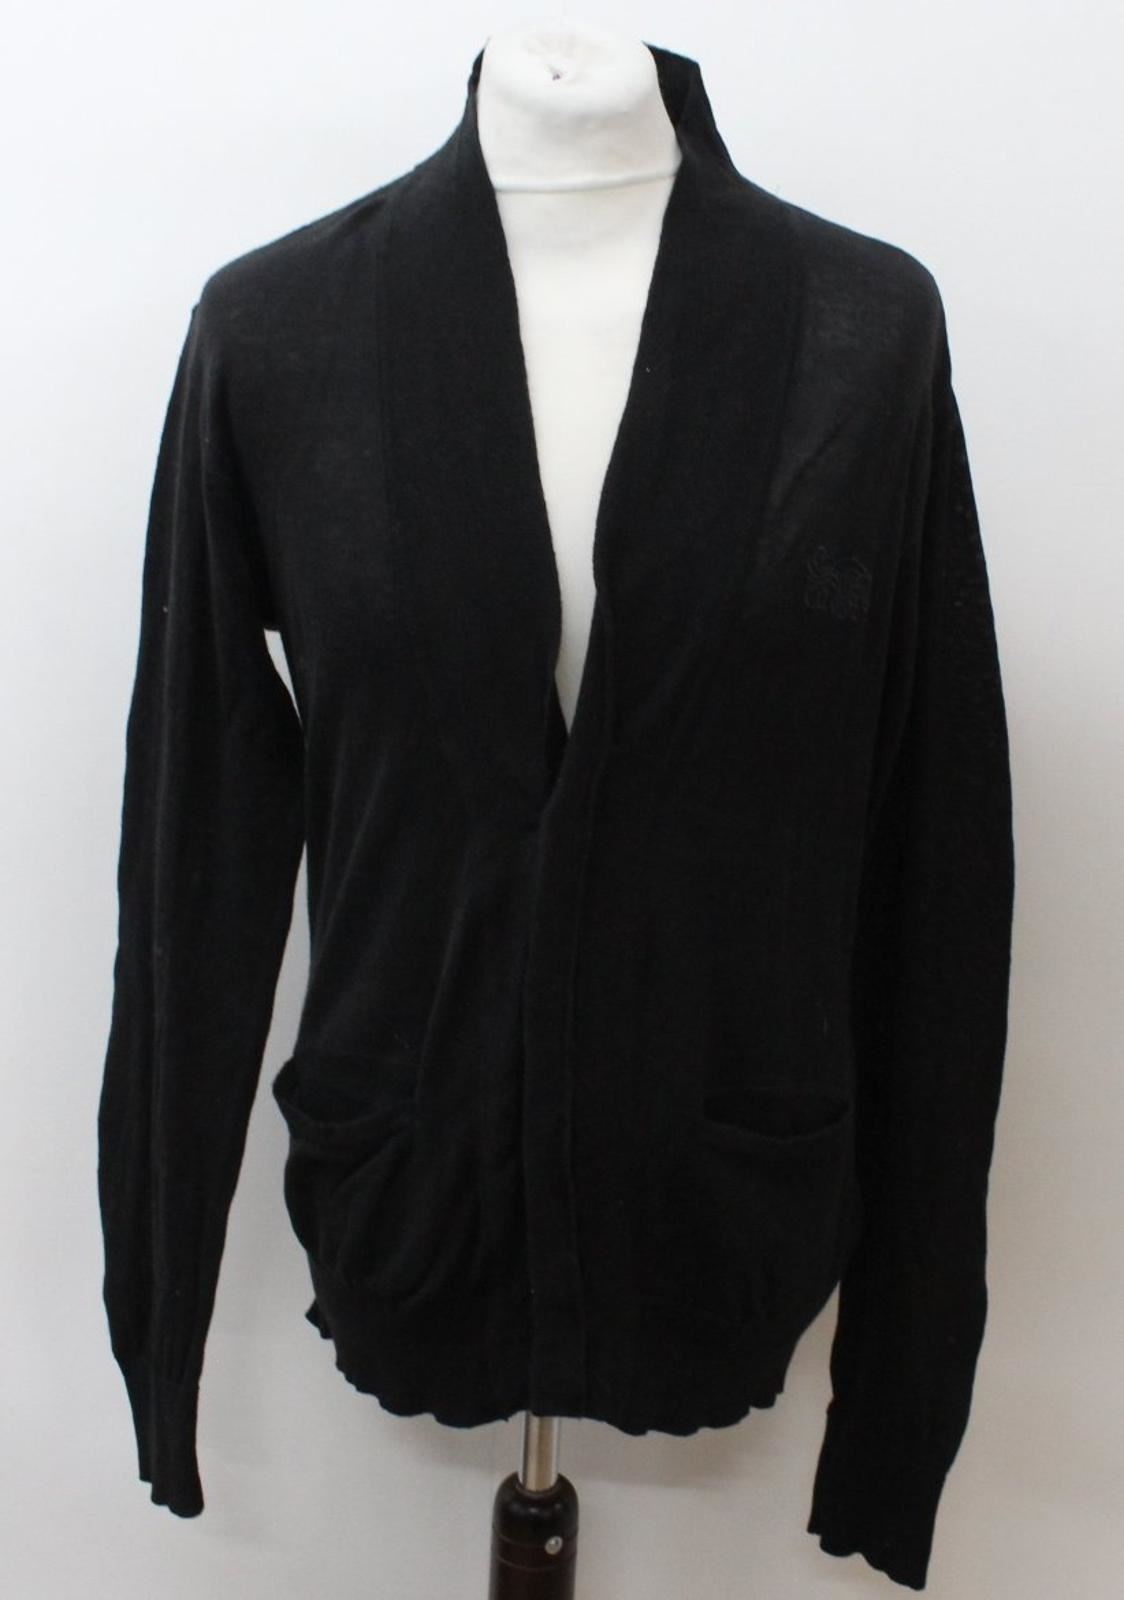 Bolongaro Trevor para hombre Negro algodón mangas largas cardigan delantera botón-Talla L